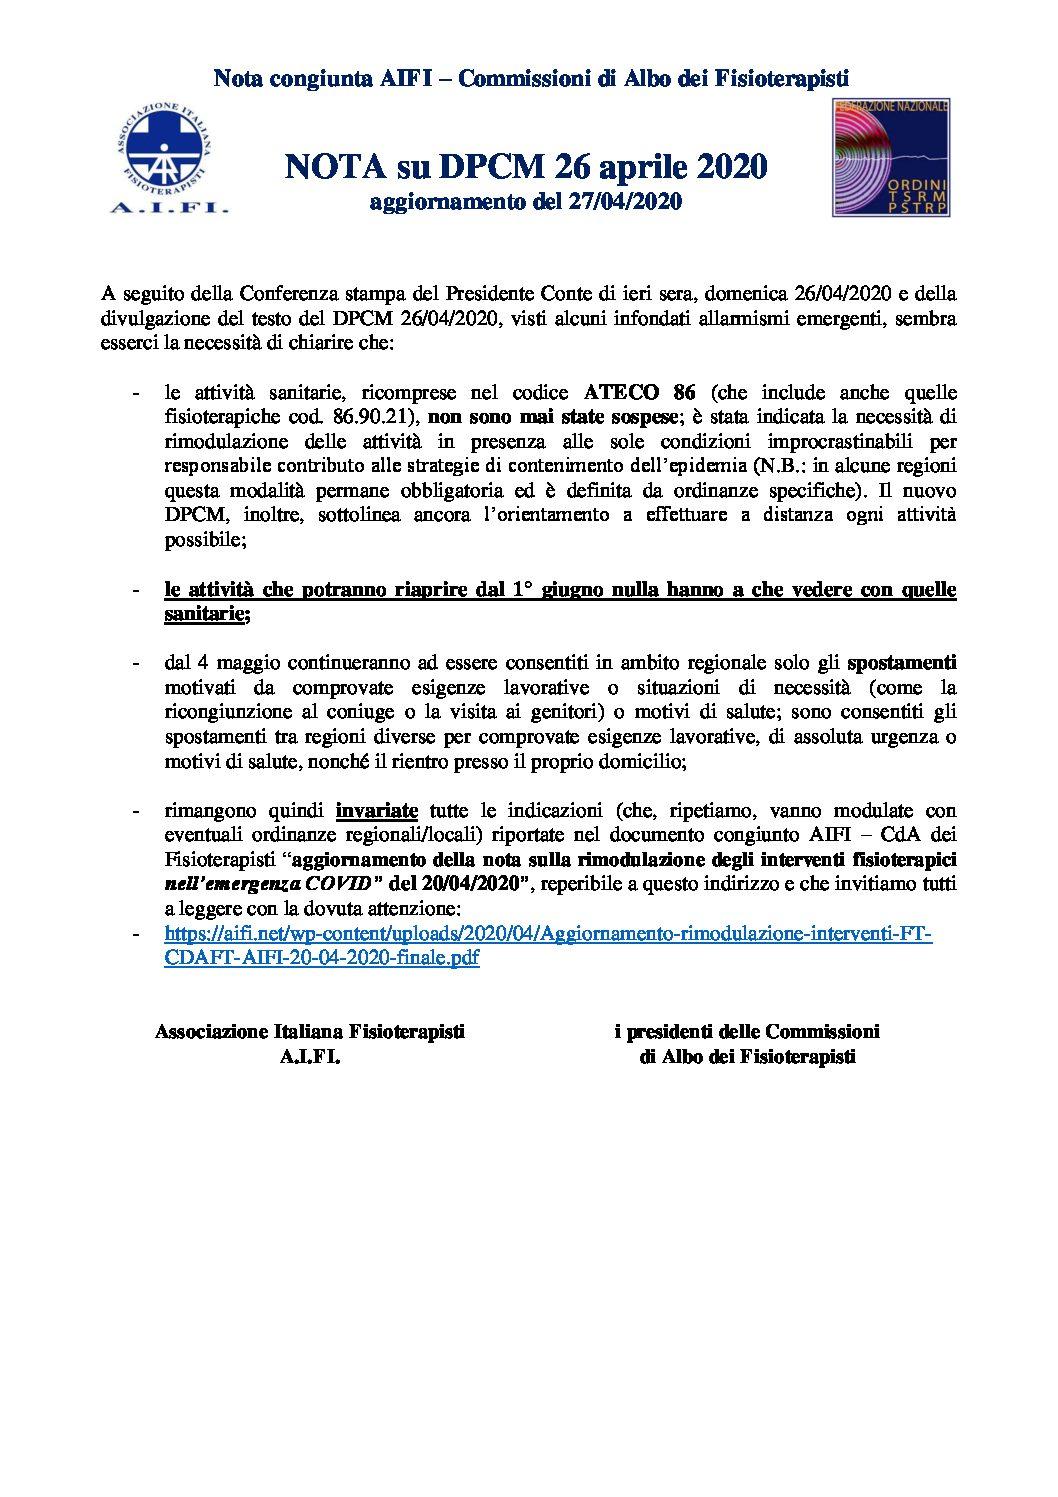 NOTA SU DPCM 26 04 20 pdf